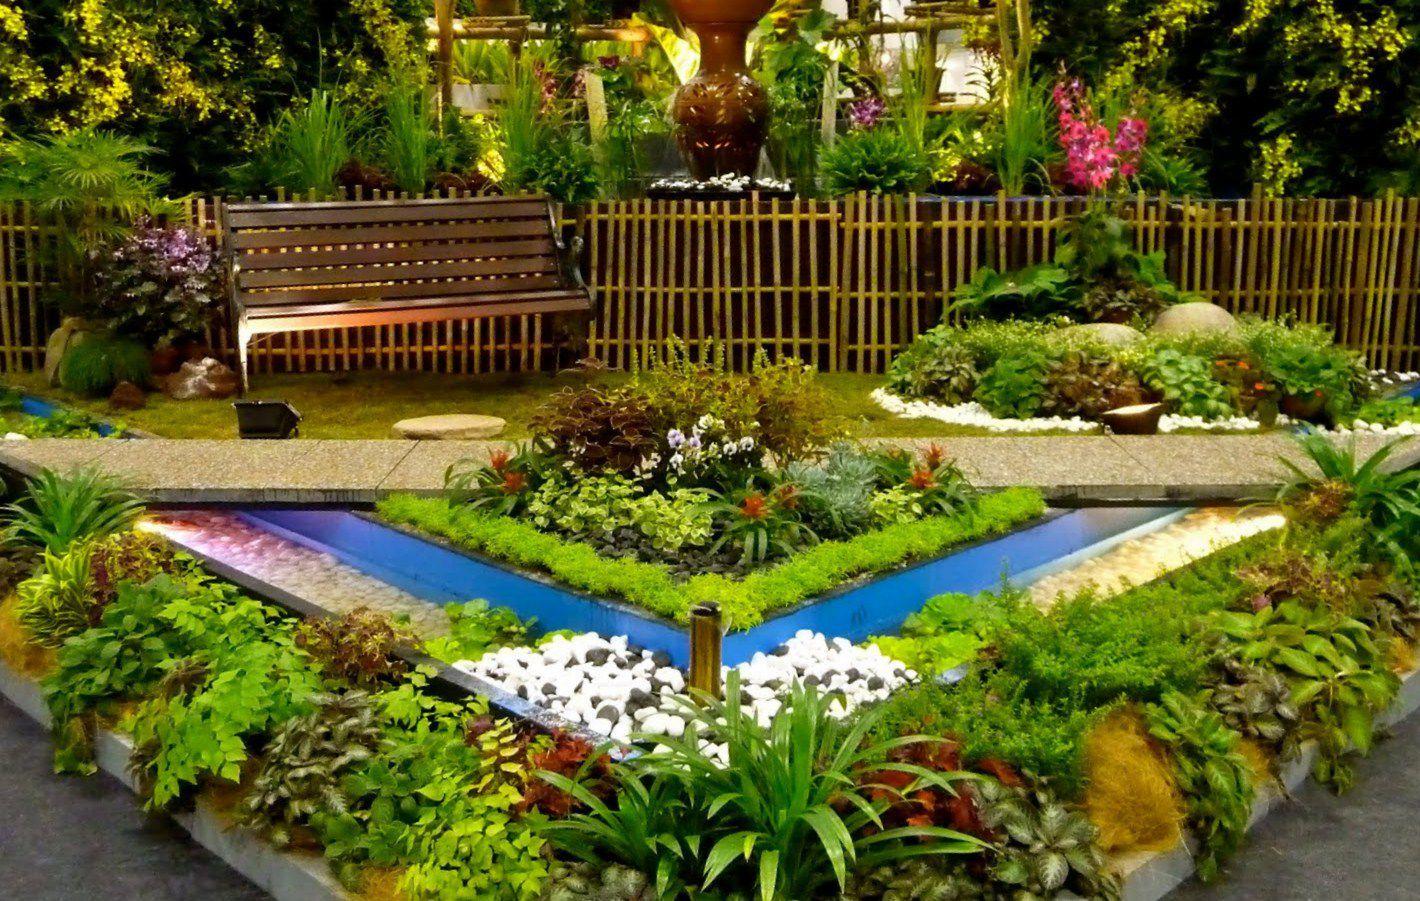 Flower Garden Design Ideas Part - 20: Small Flower Garden Design